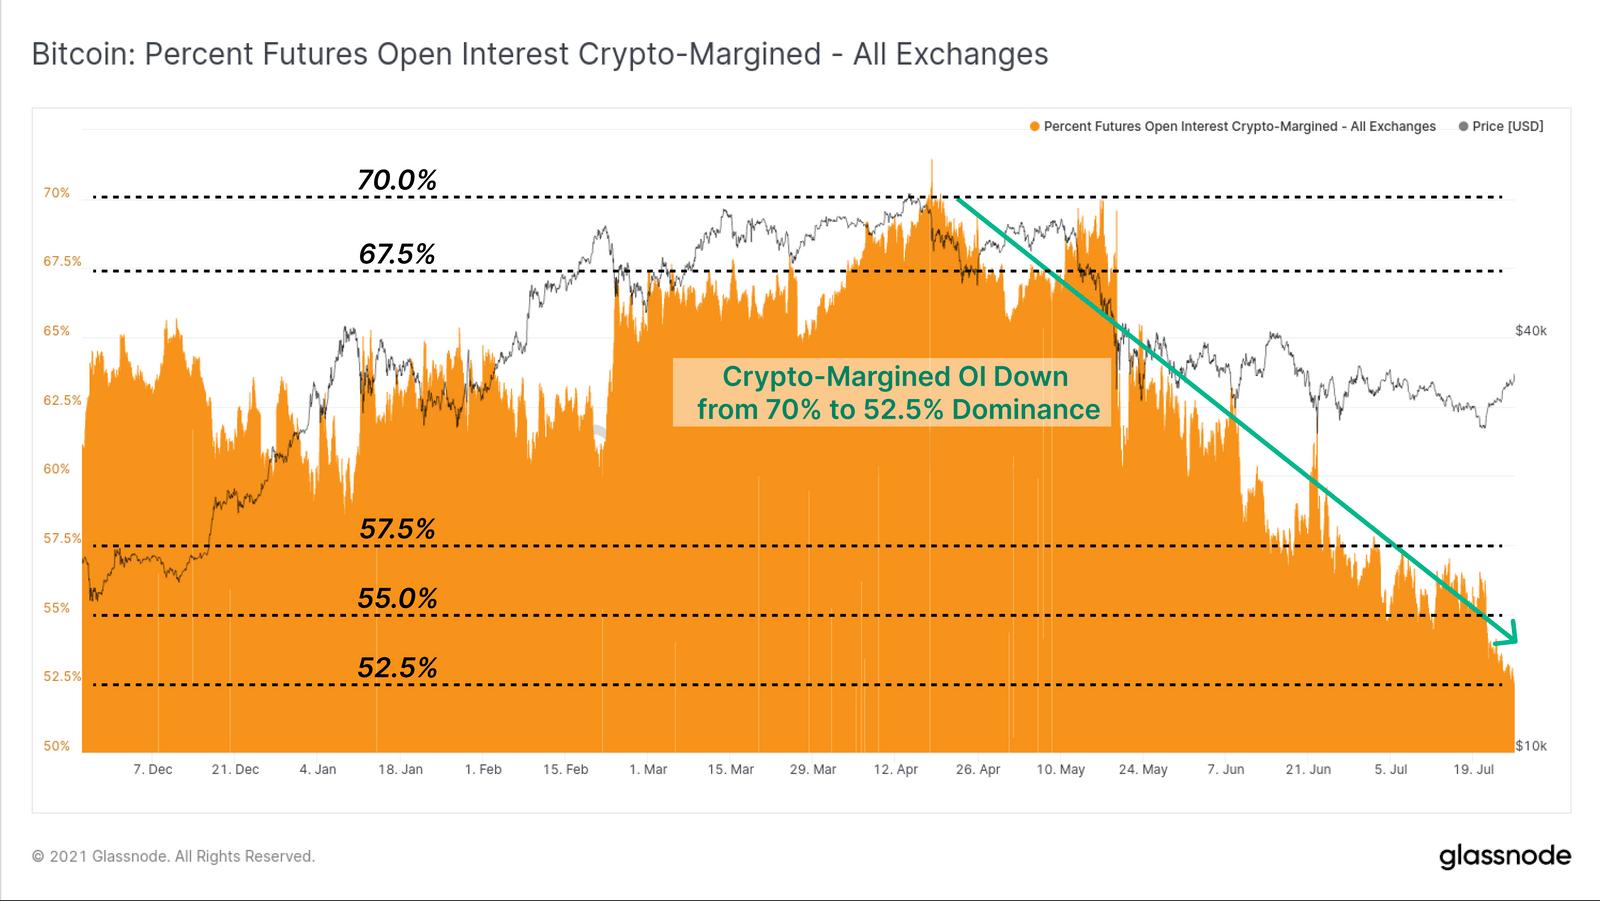 Open Interest in Coin-Margin